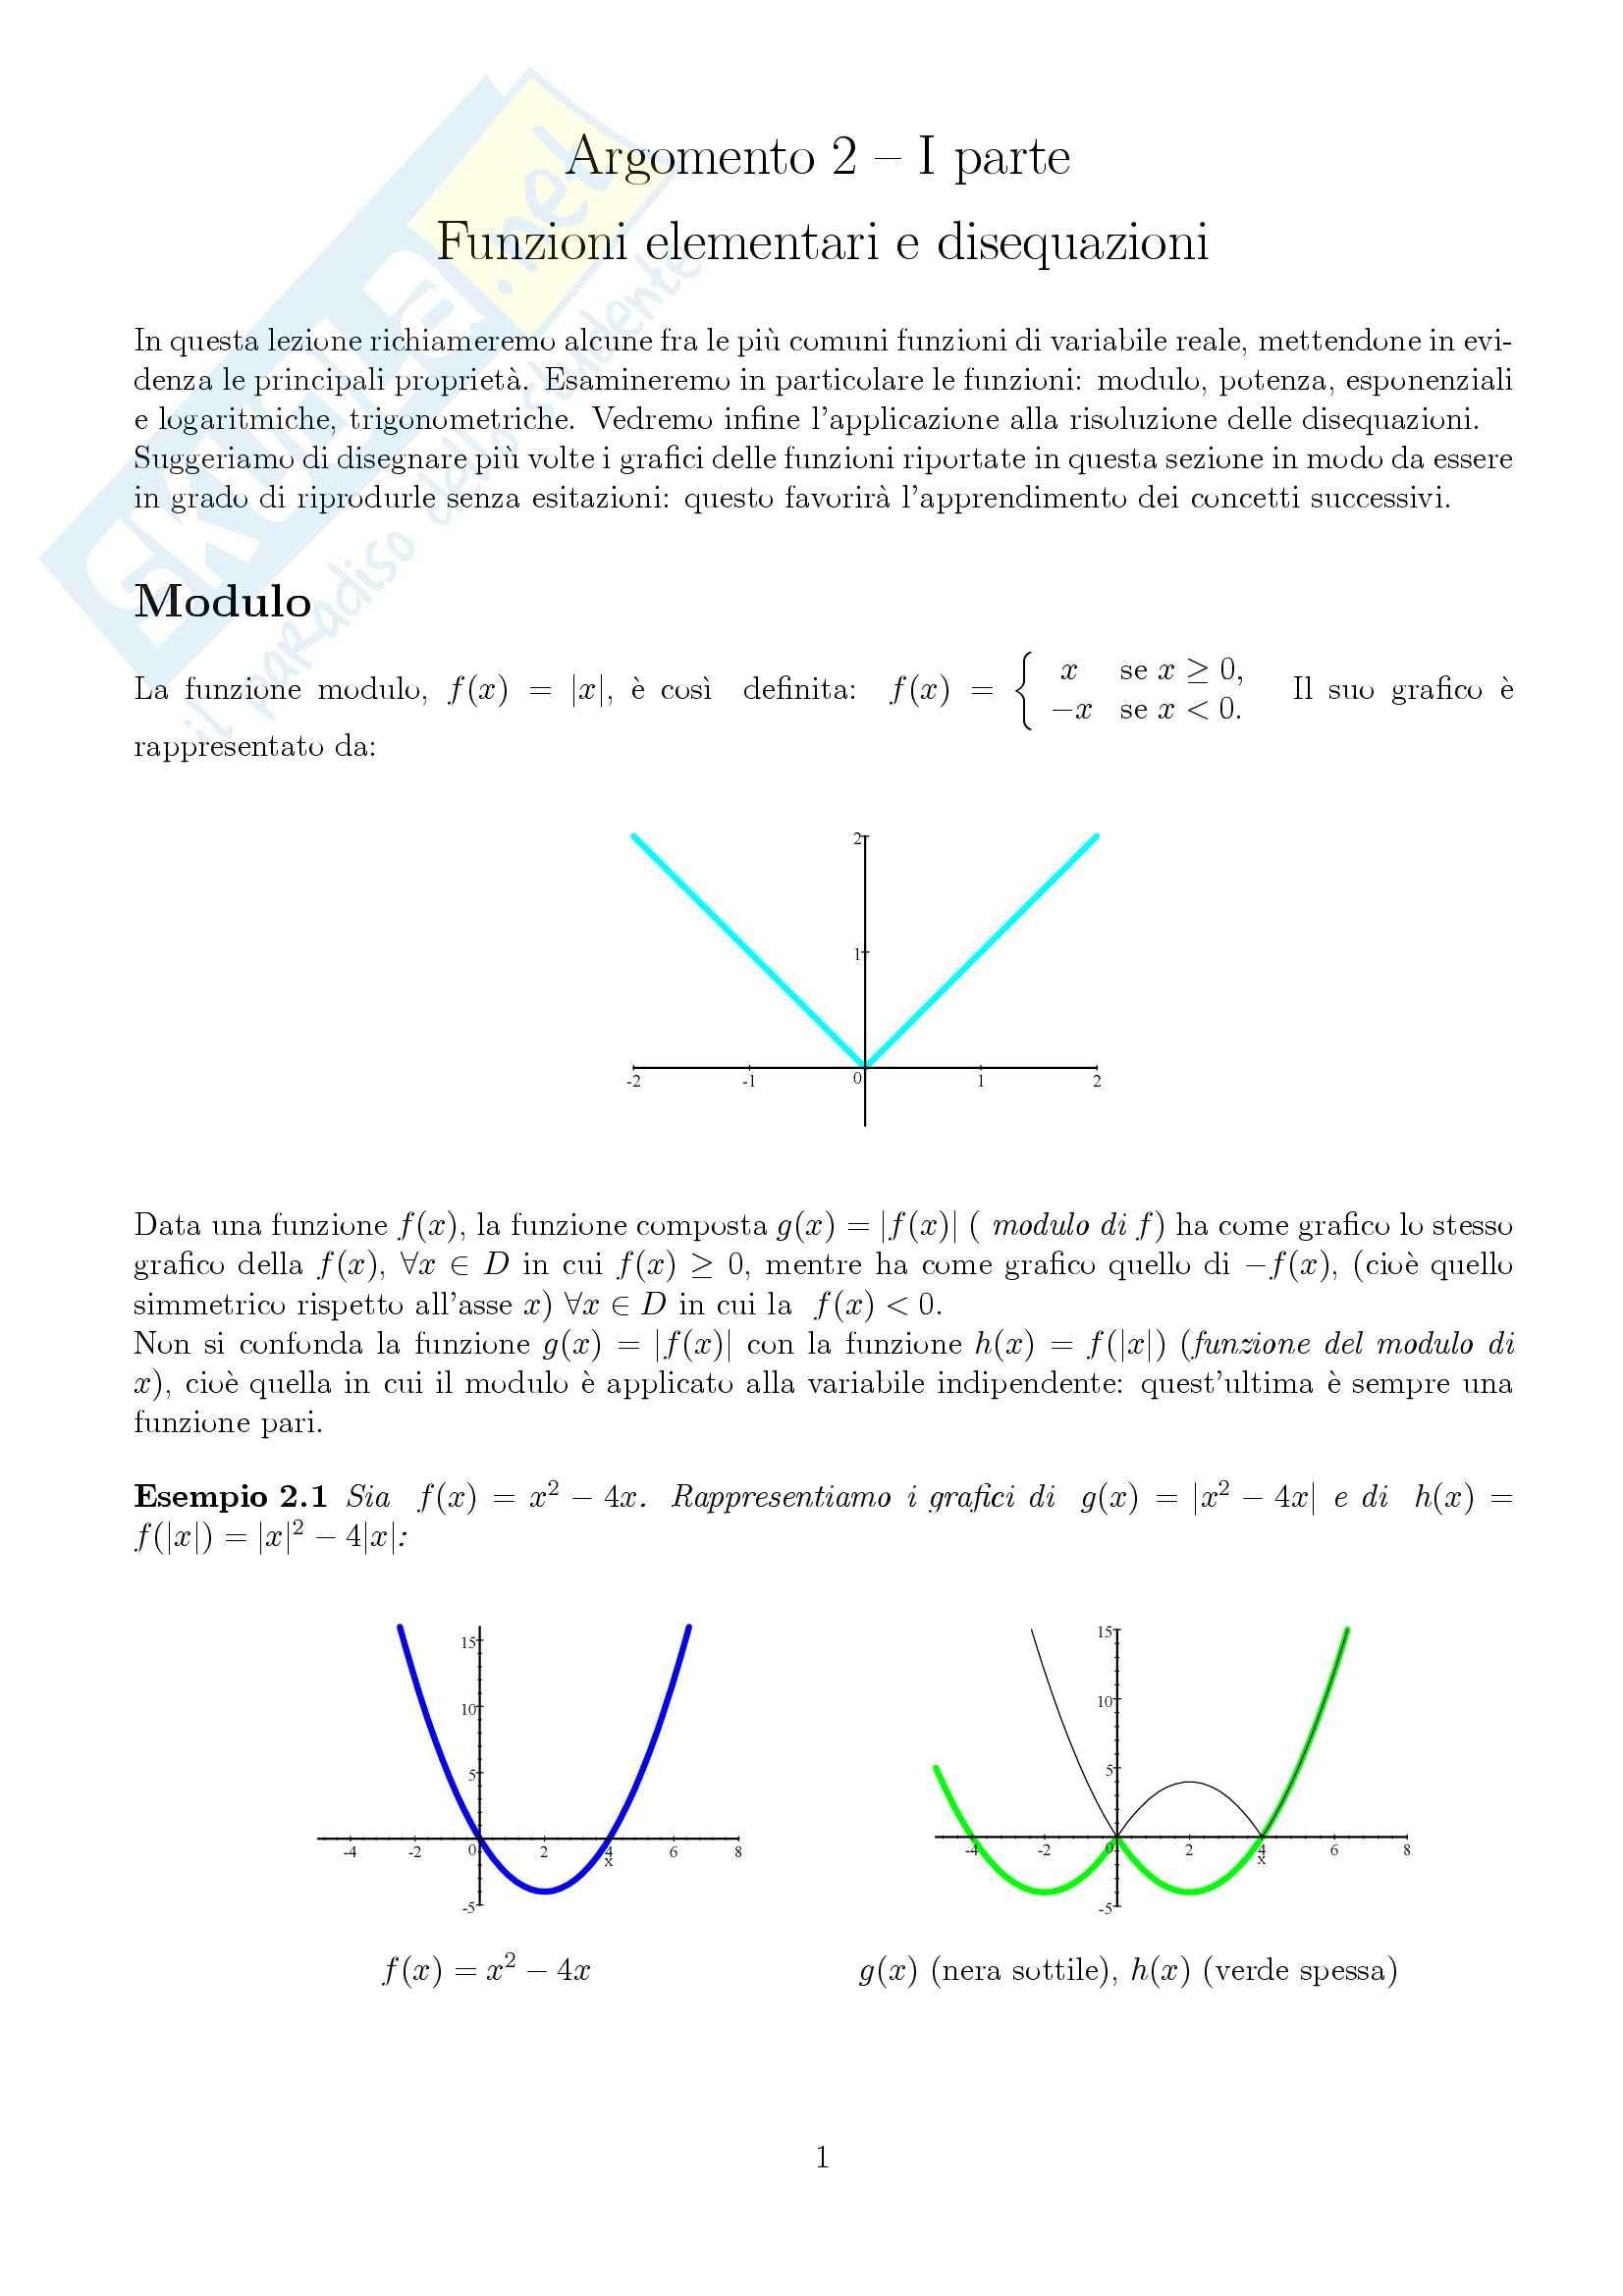 Funzioni elementari e disequazioni